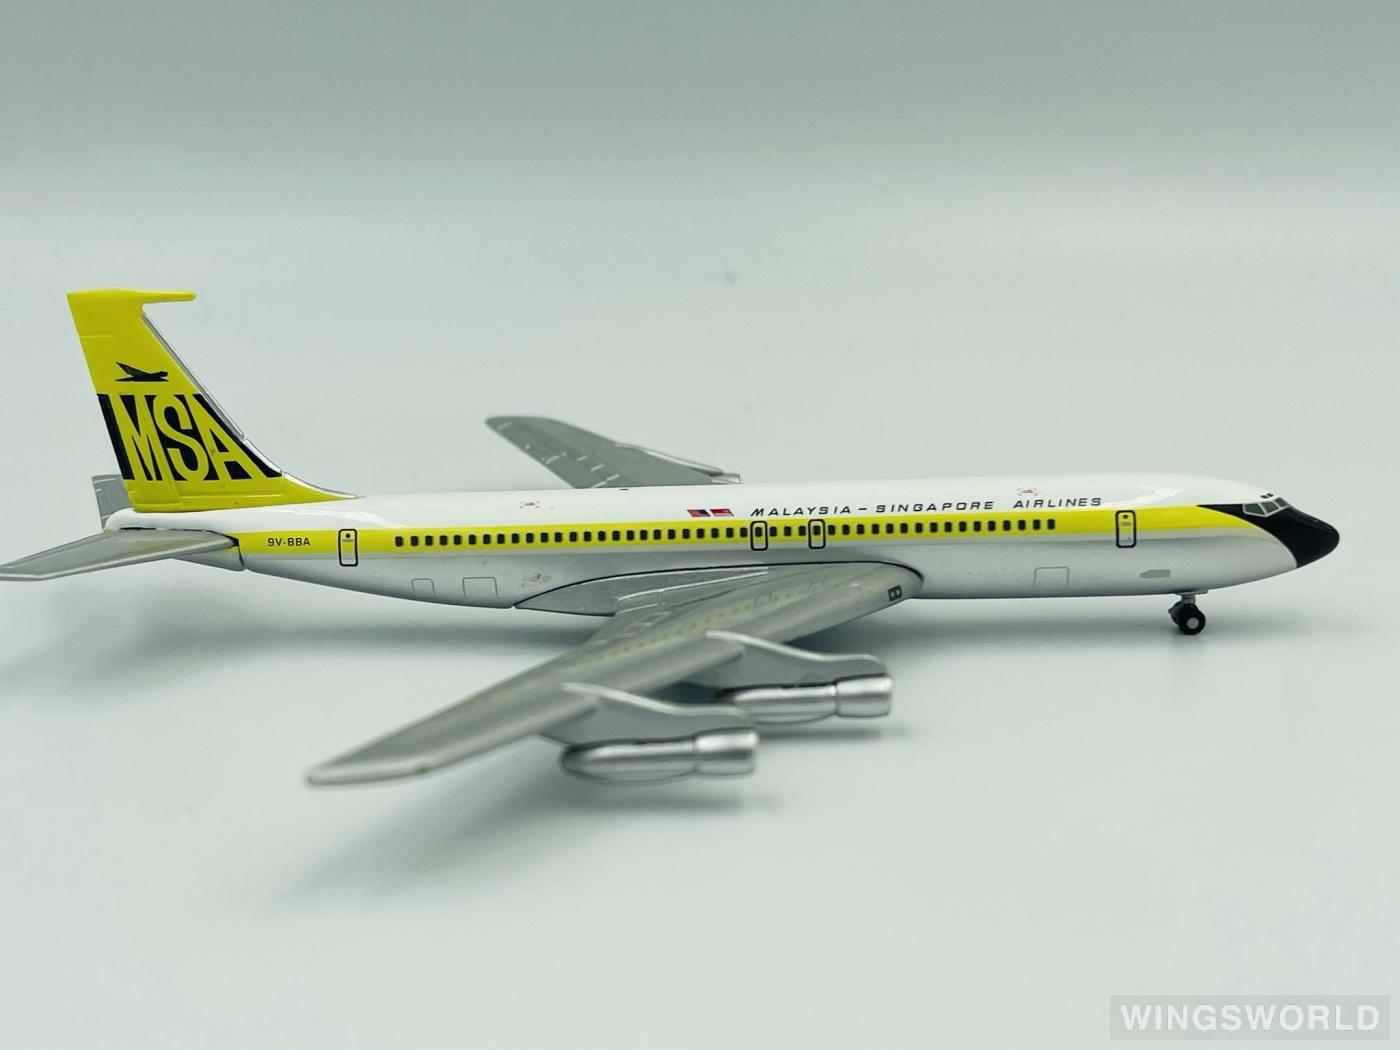 Geminijets 1:400 GJMSA386 MSA 马来西亚-新加坡航空 Boeing 707-300 9V-BBA